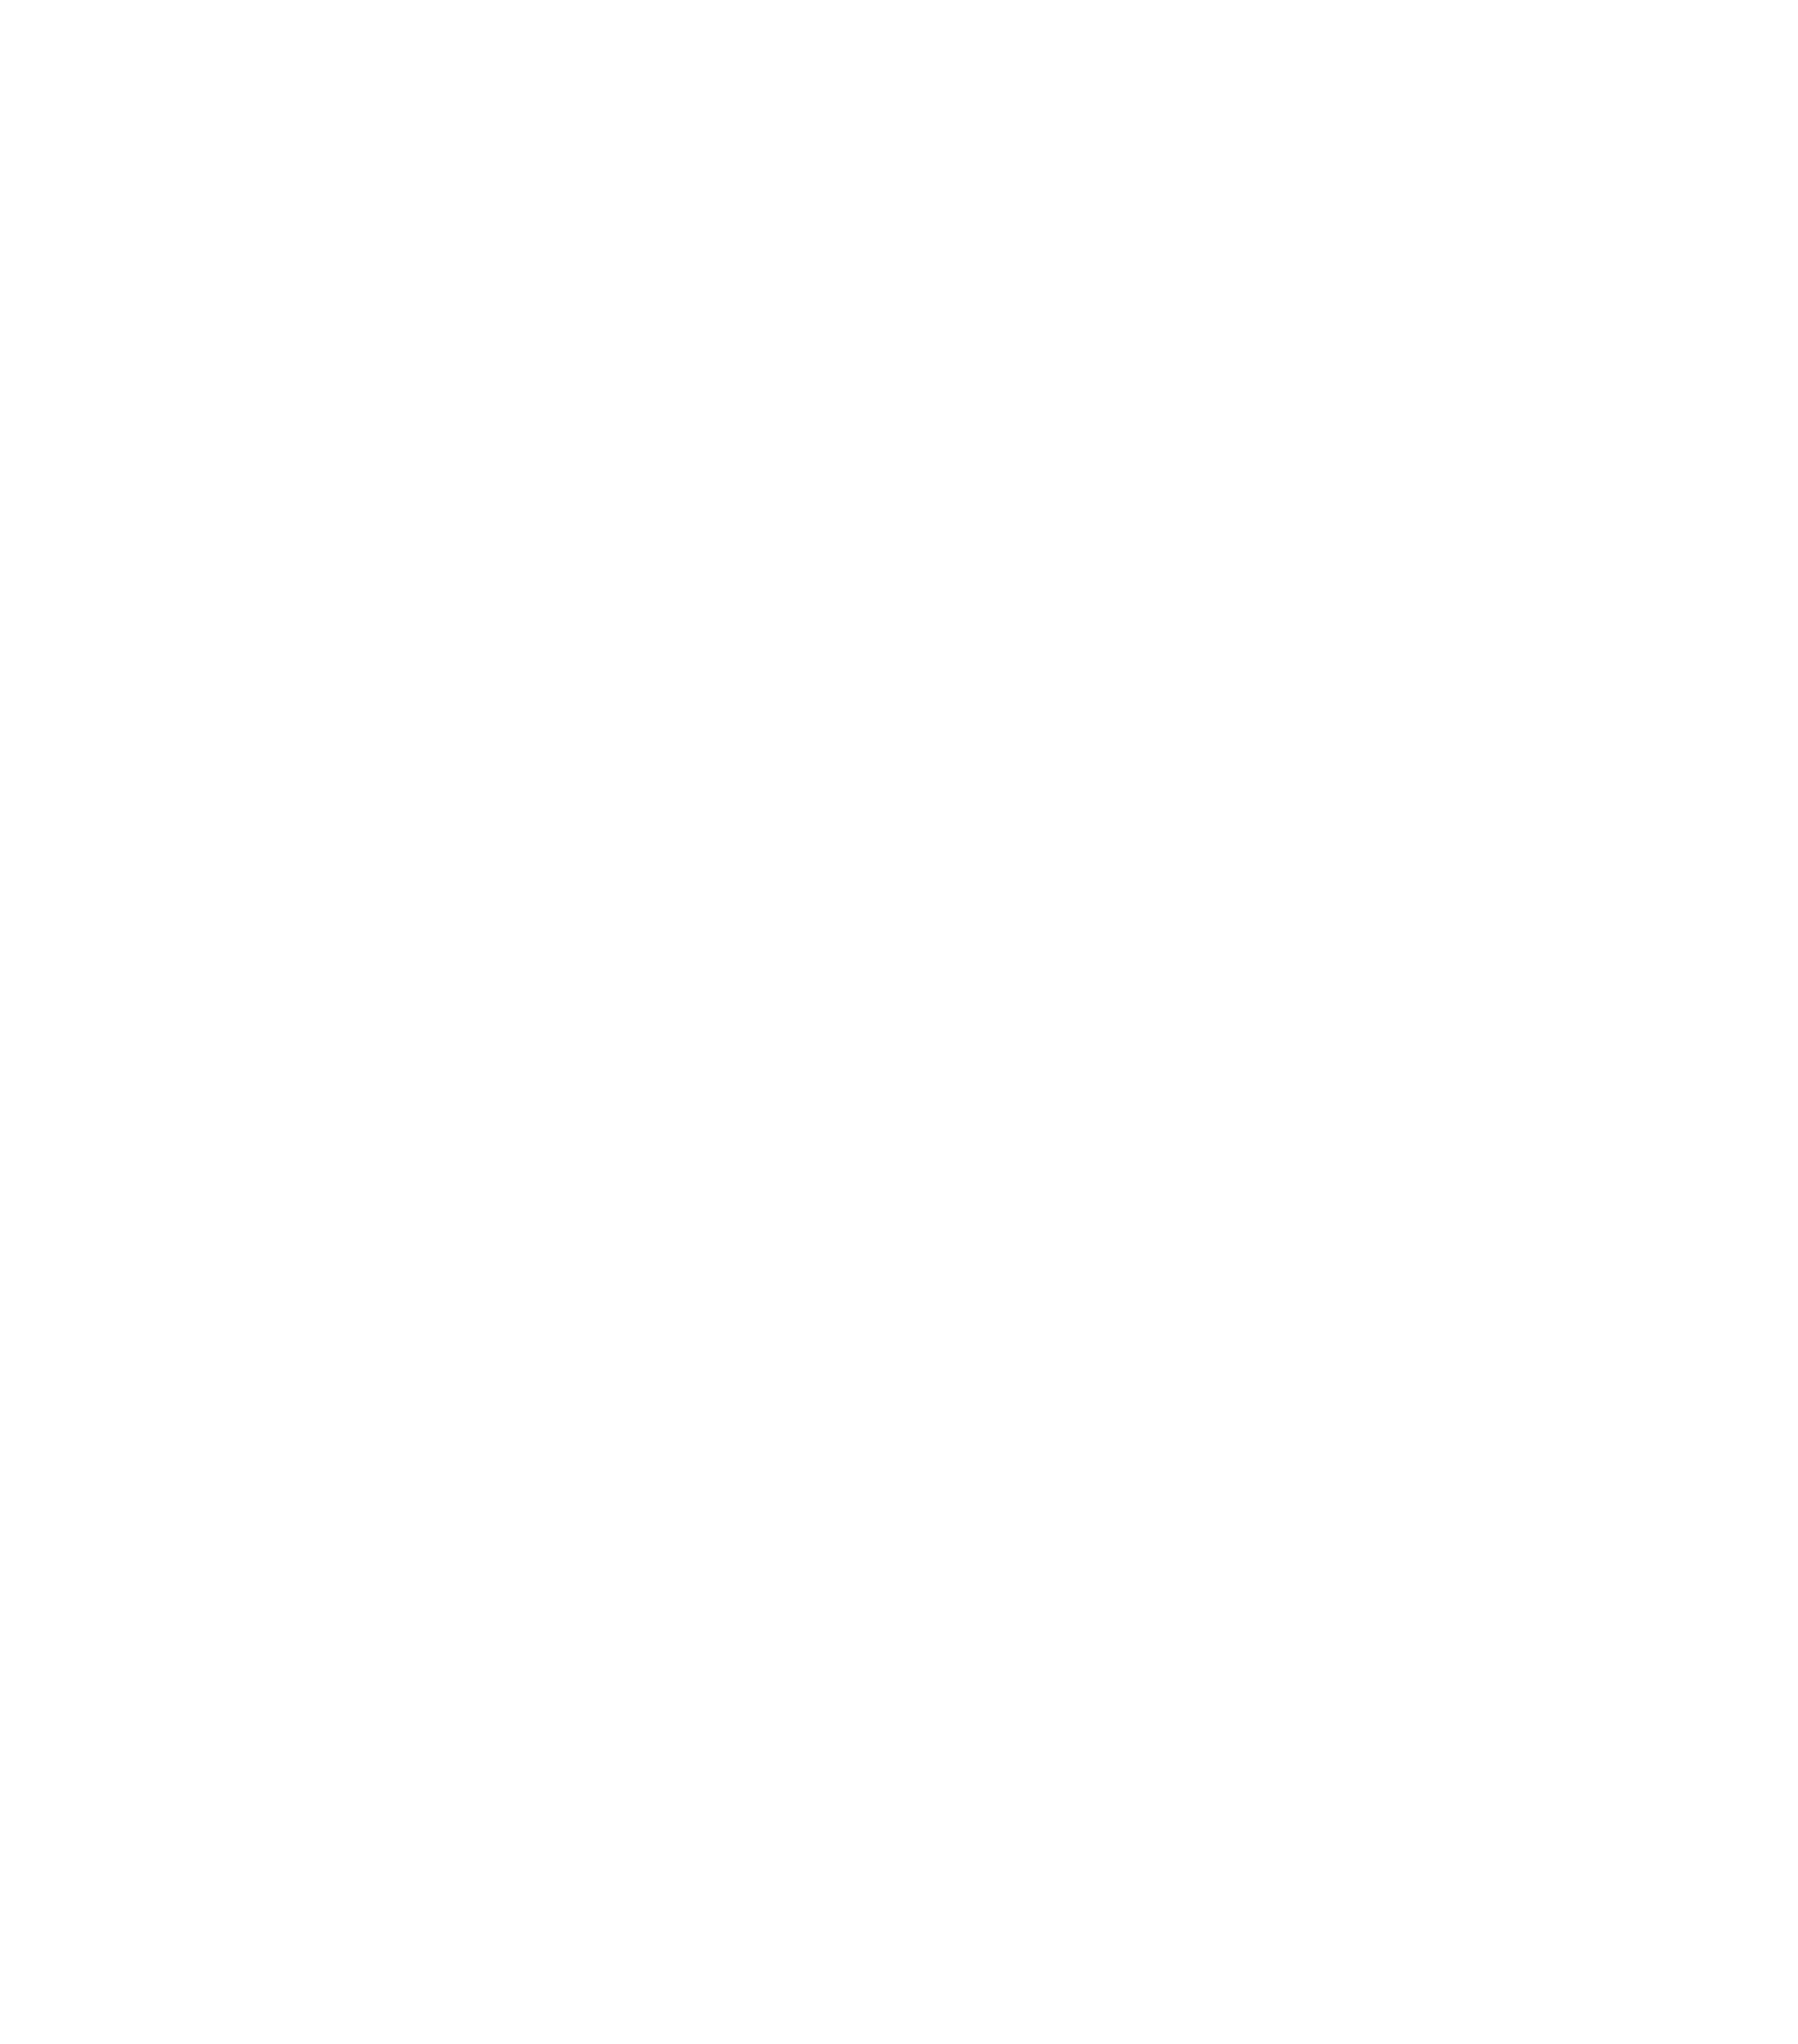 ROCK'N COUNTRY LOGO white